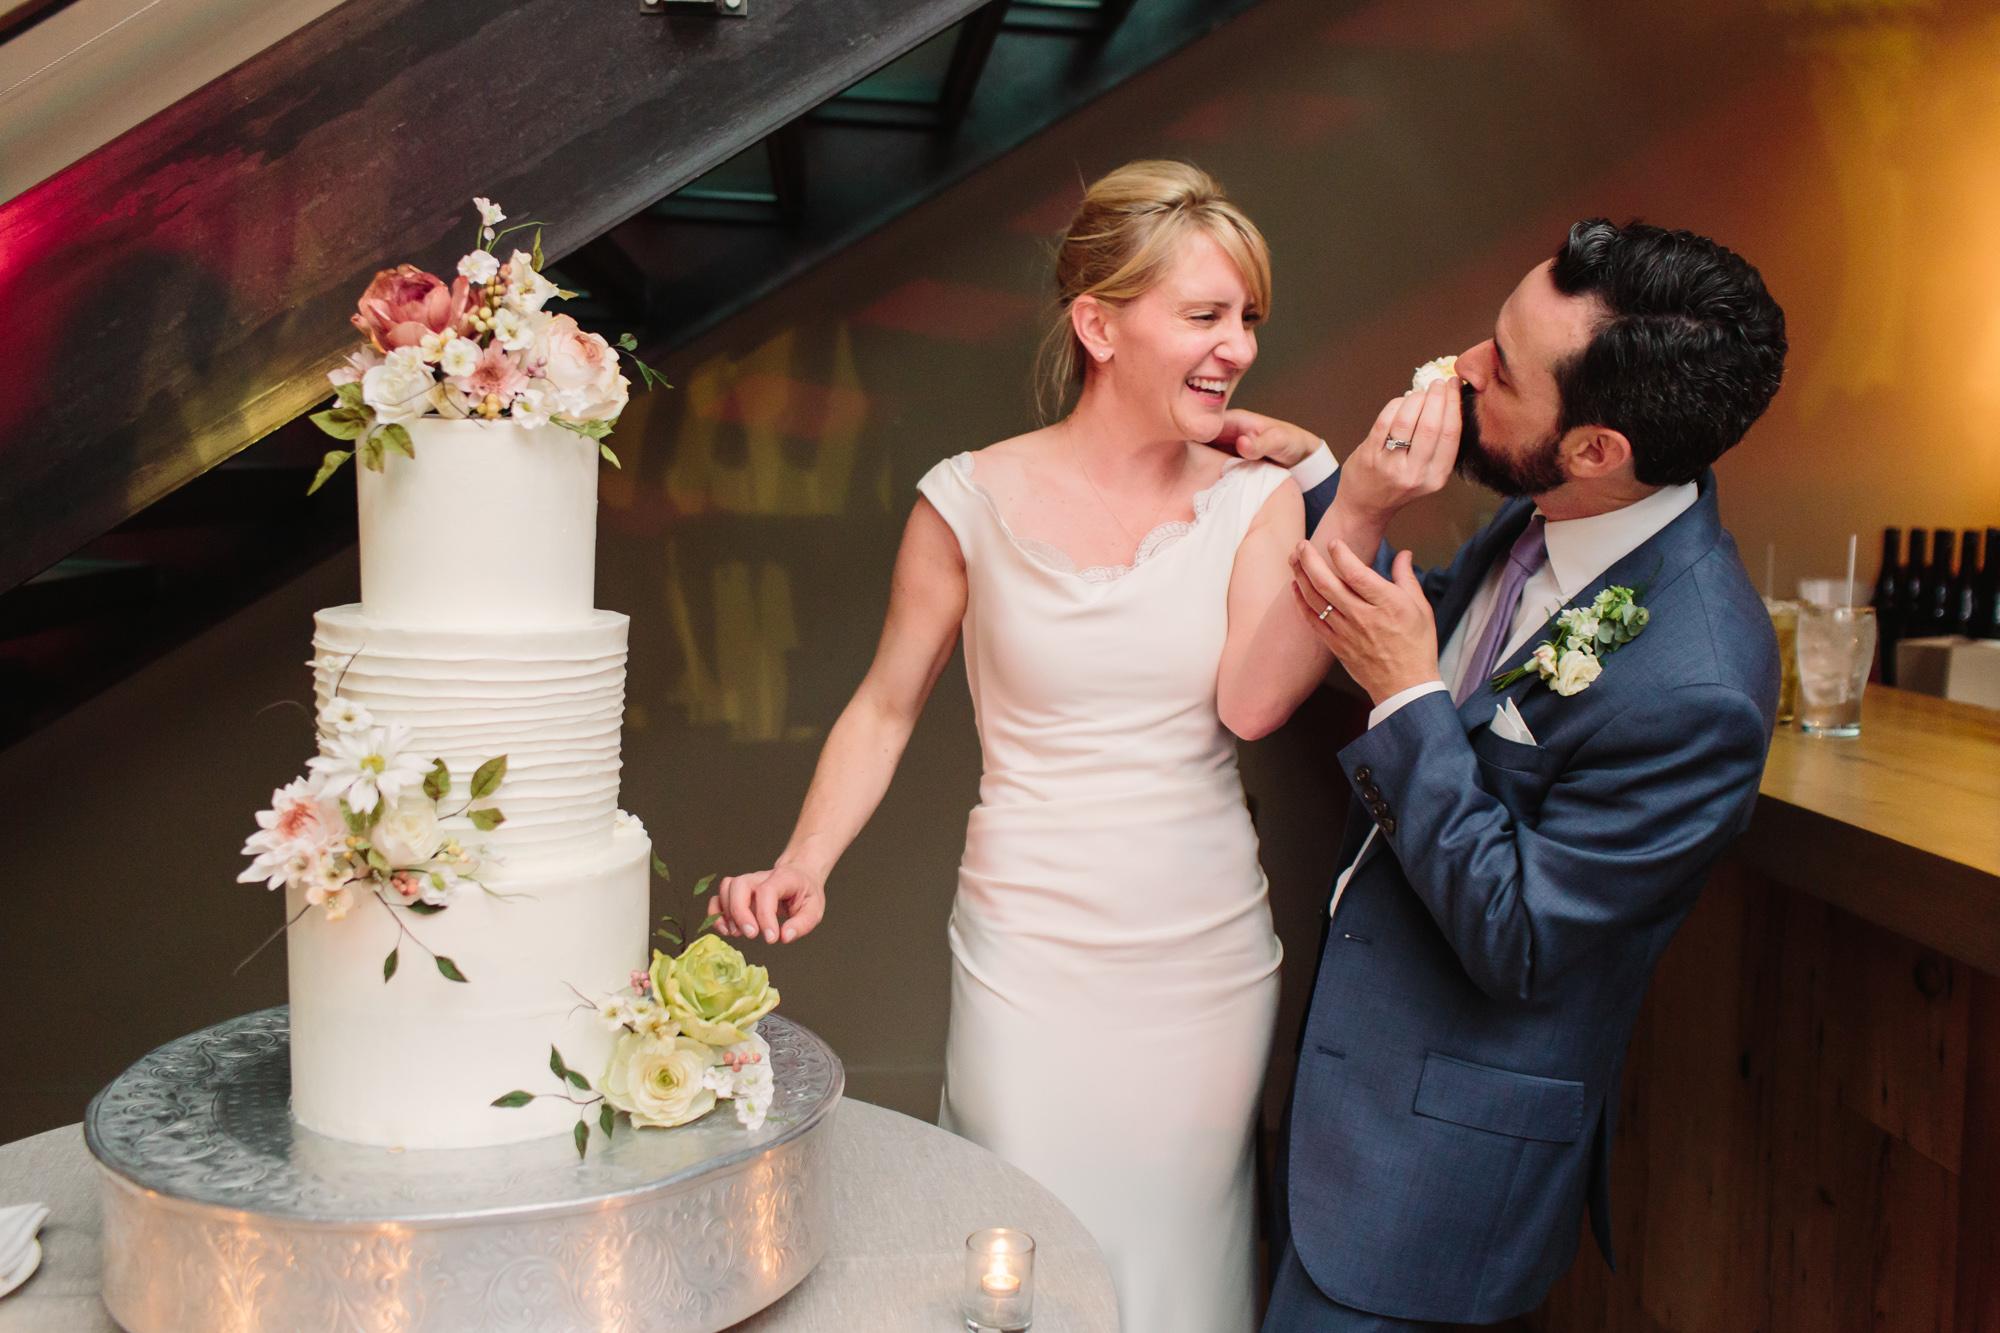 80_Rowan_Brian_The_Roundhouse_Wedding_Beacon_NY_Tanya_Salazar_Photography_980.jpg